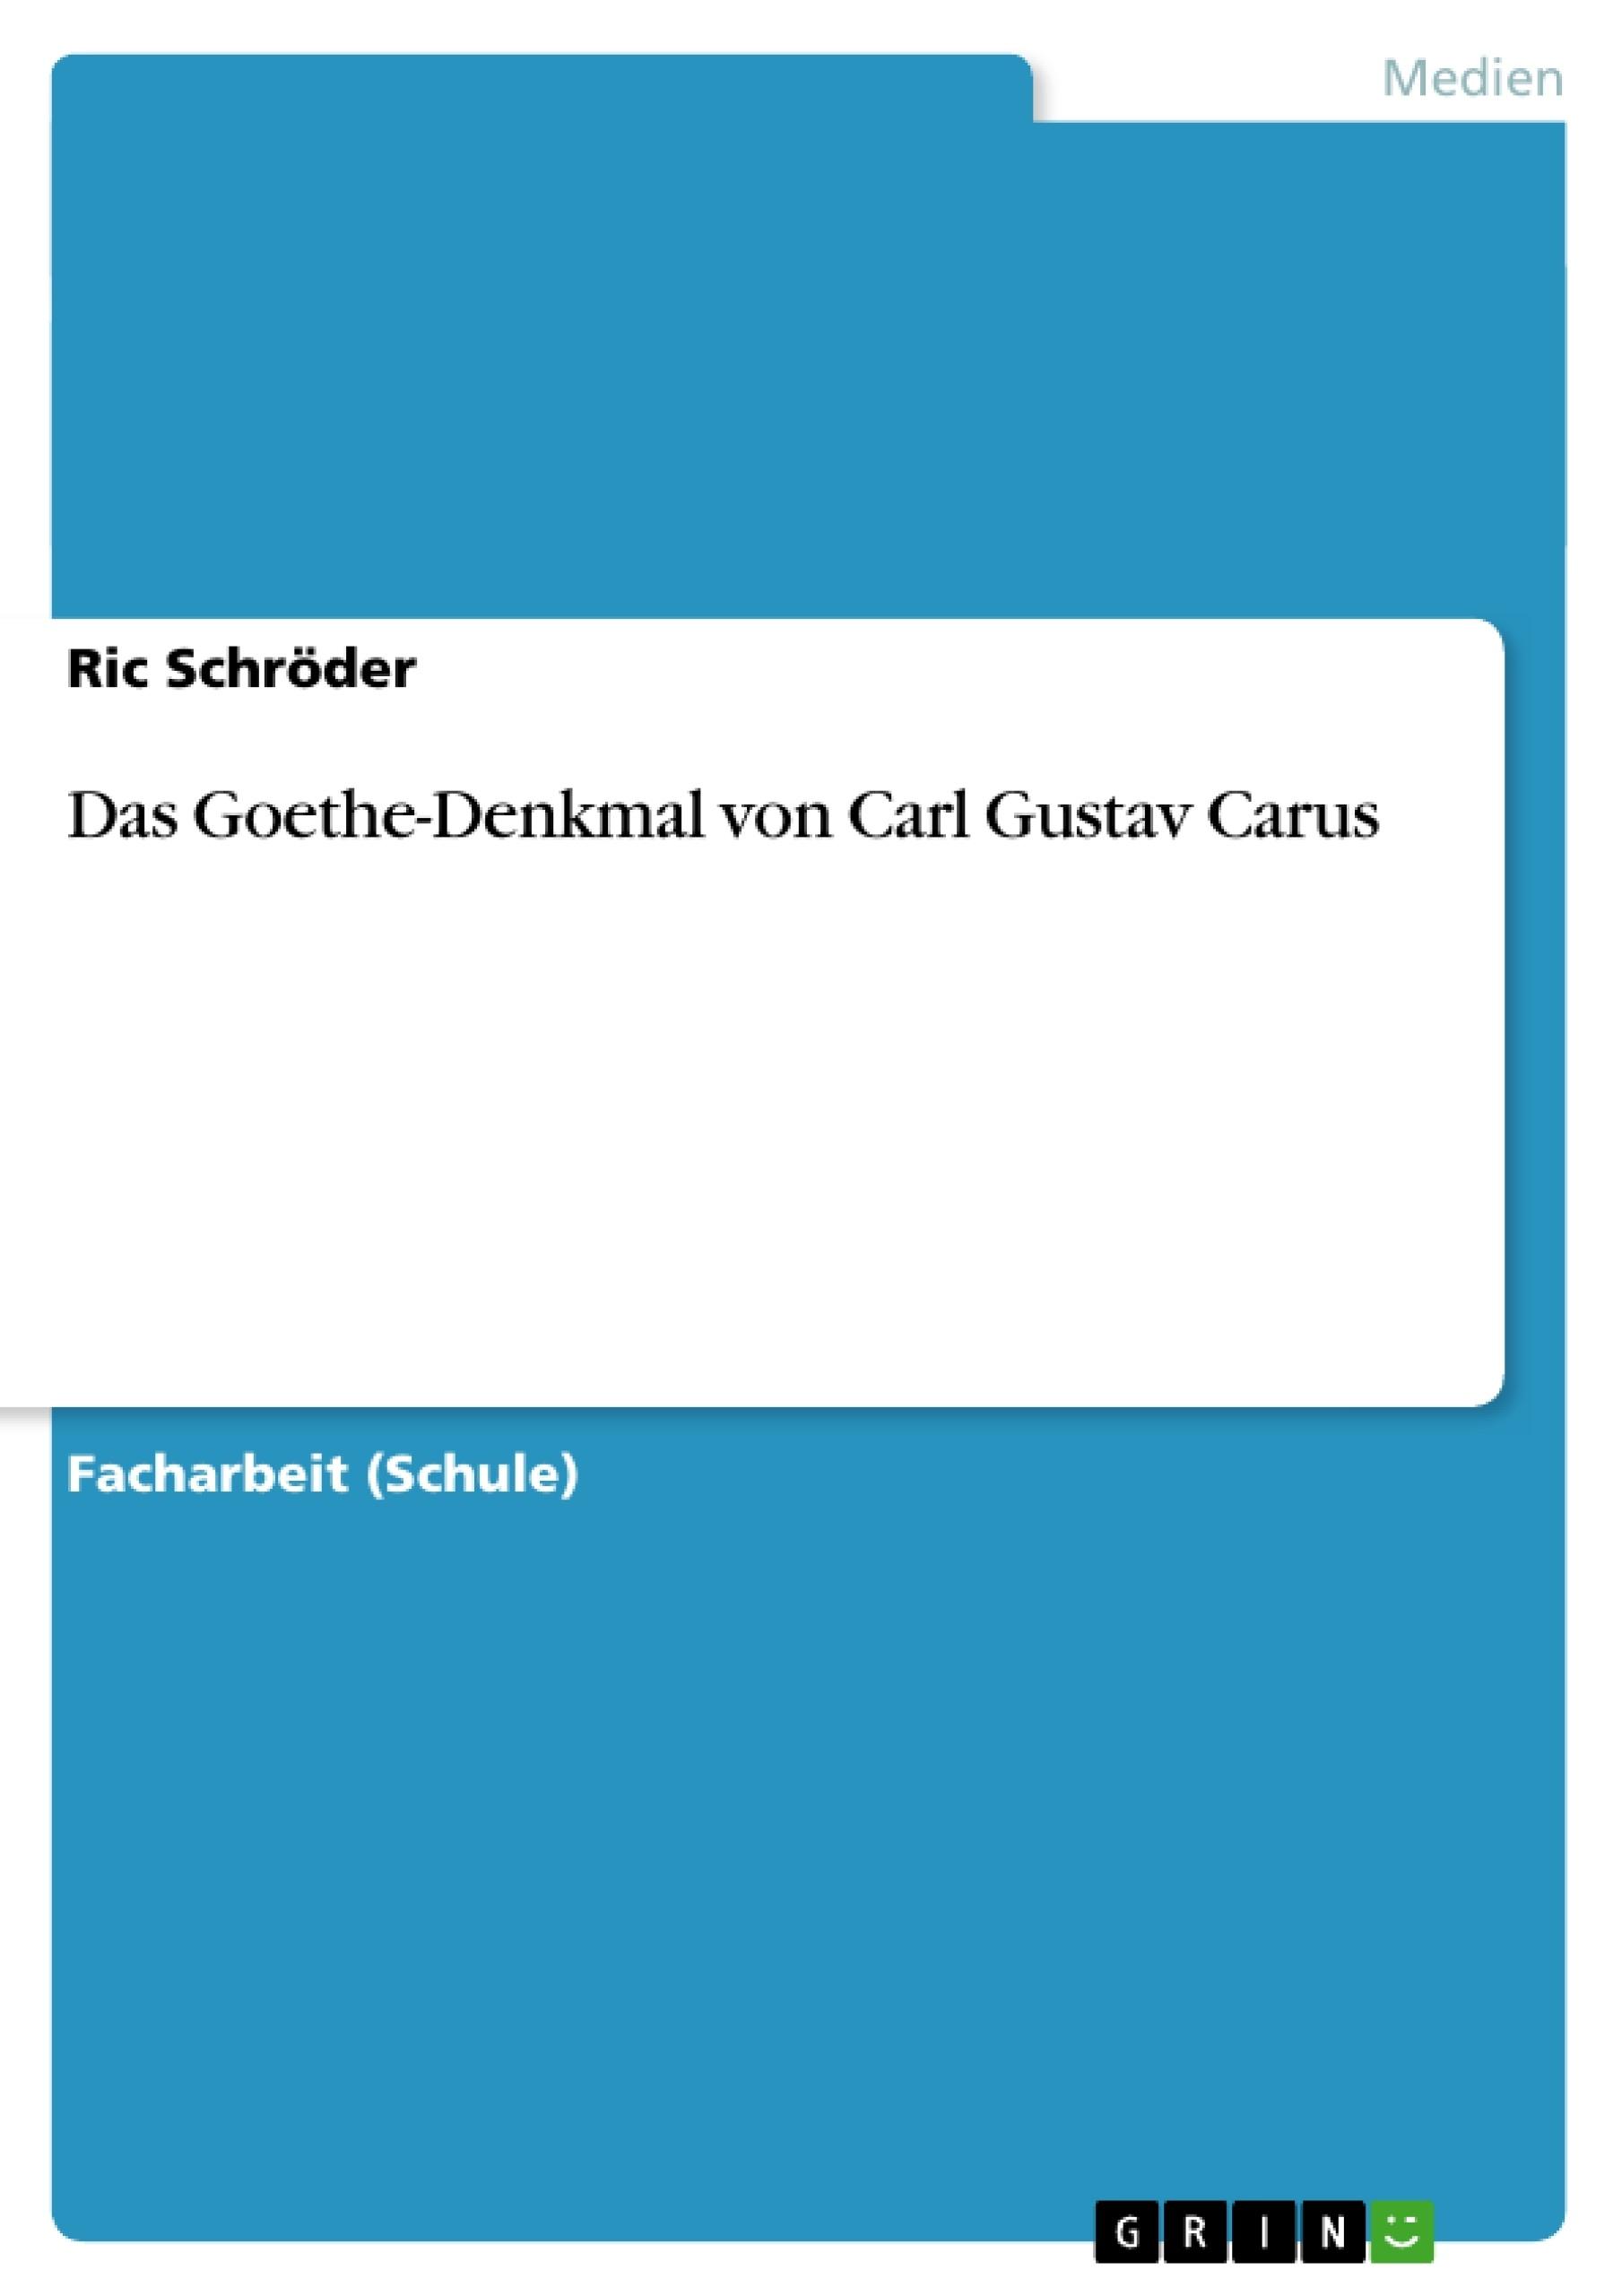 Titel: Das Goethe-Denkmal von Carl Gustav Carus